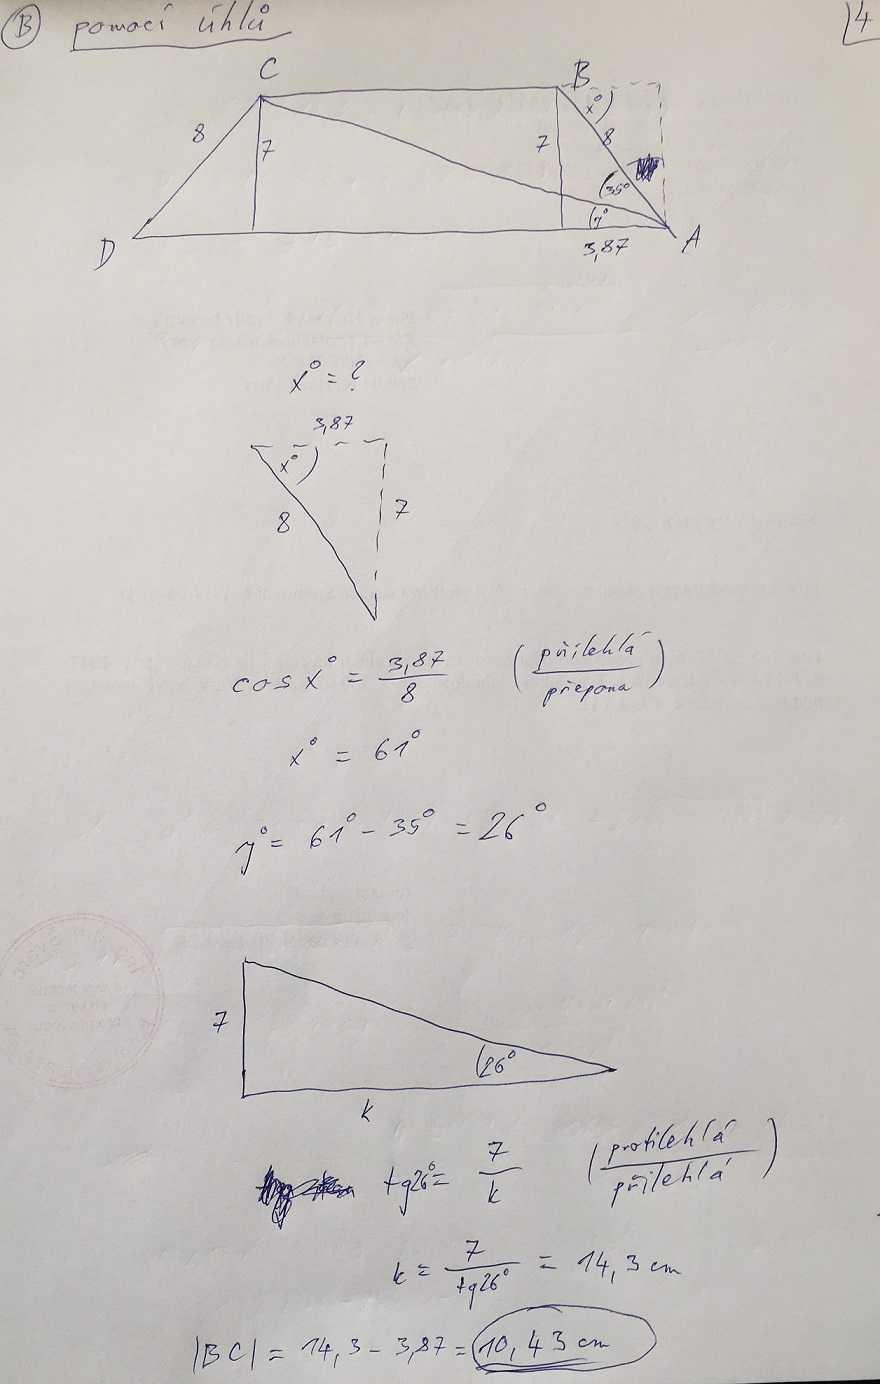 http://forum.matematika.cz/upload3/img/2017-08/85281_%25284%2529.JPG